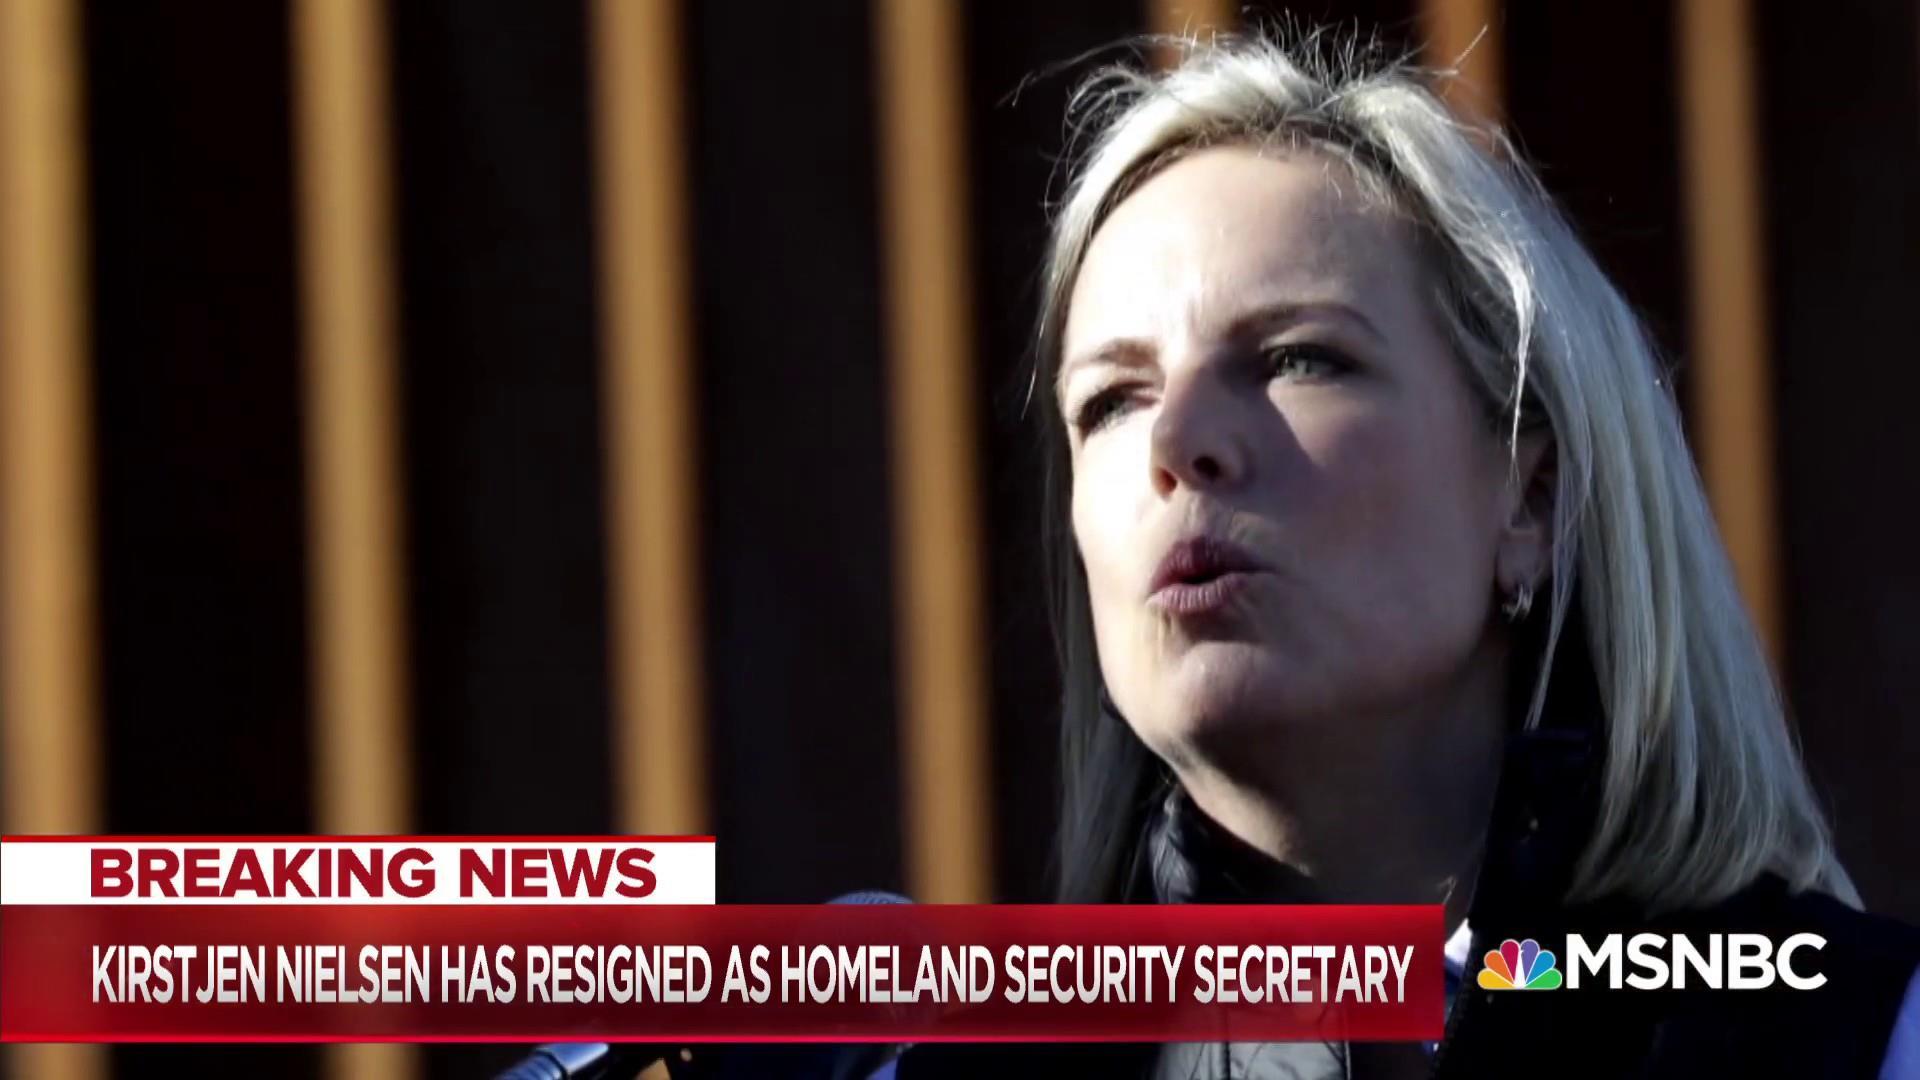 DHS Secretary Kirstjen Nielsen resigns after meeting with President Trump